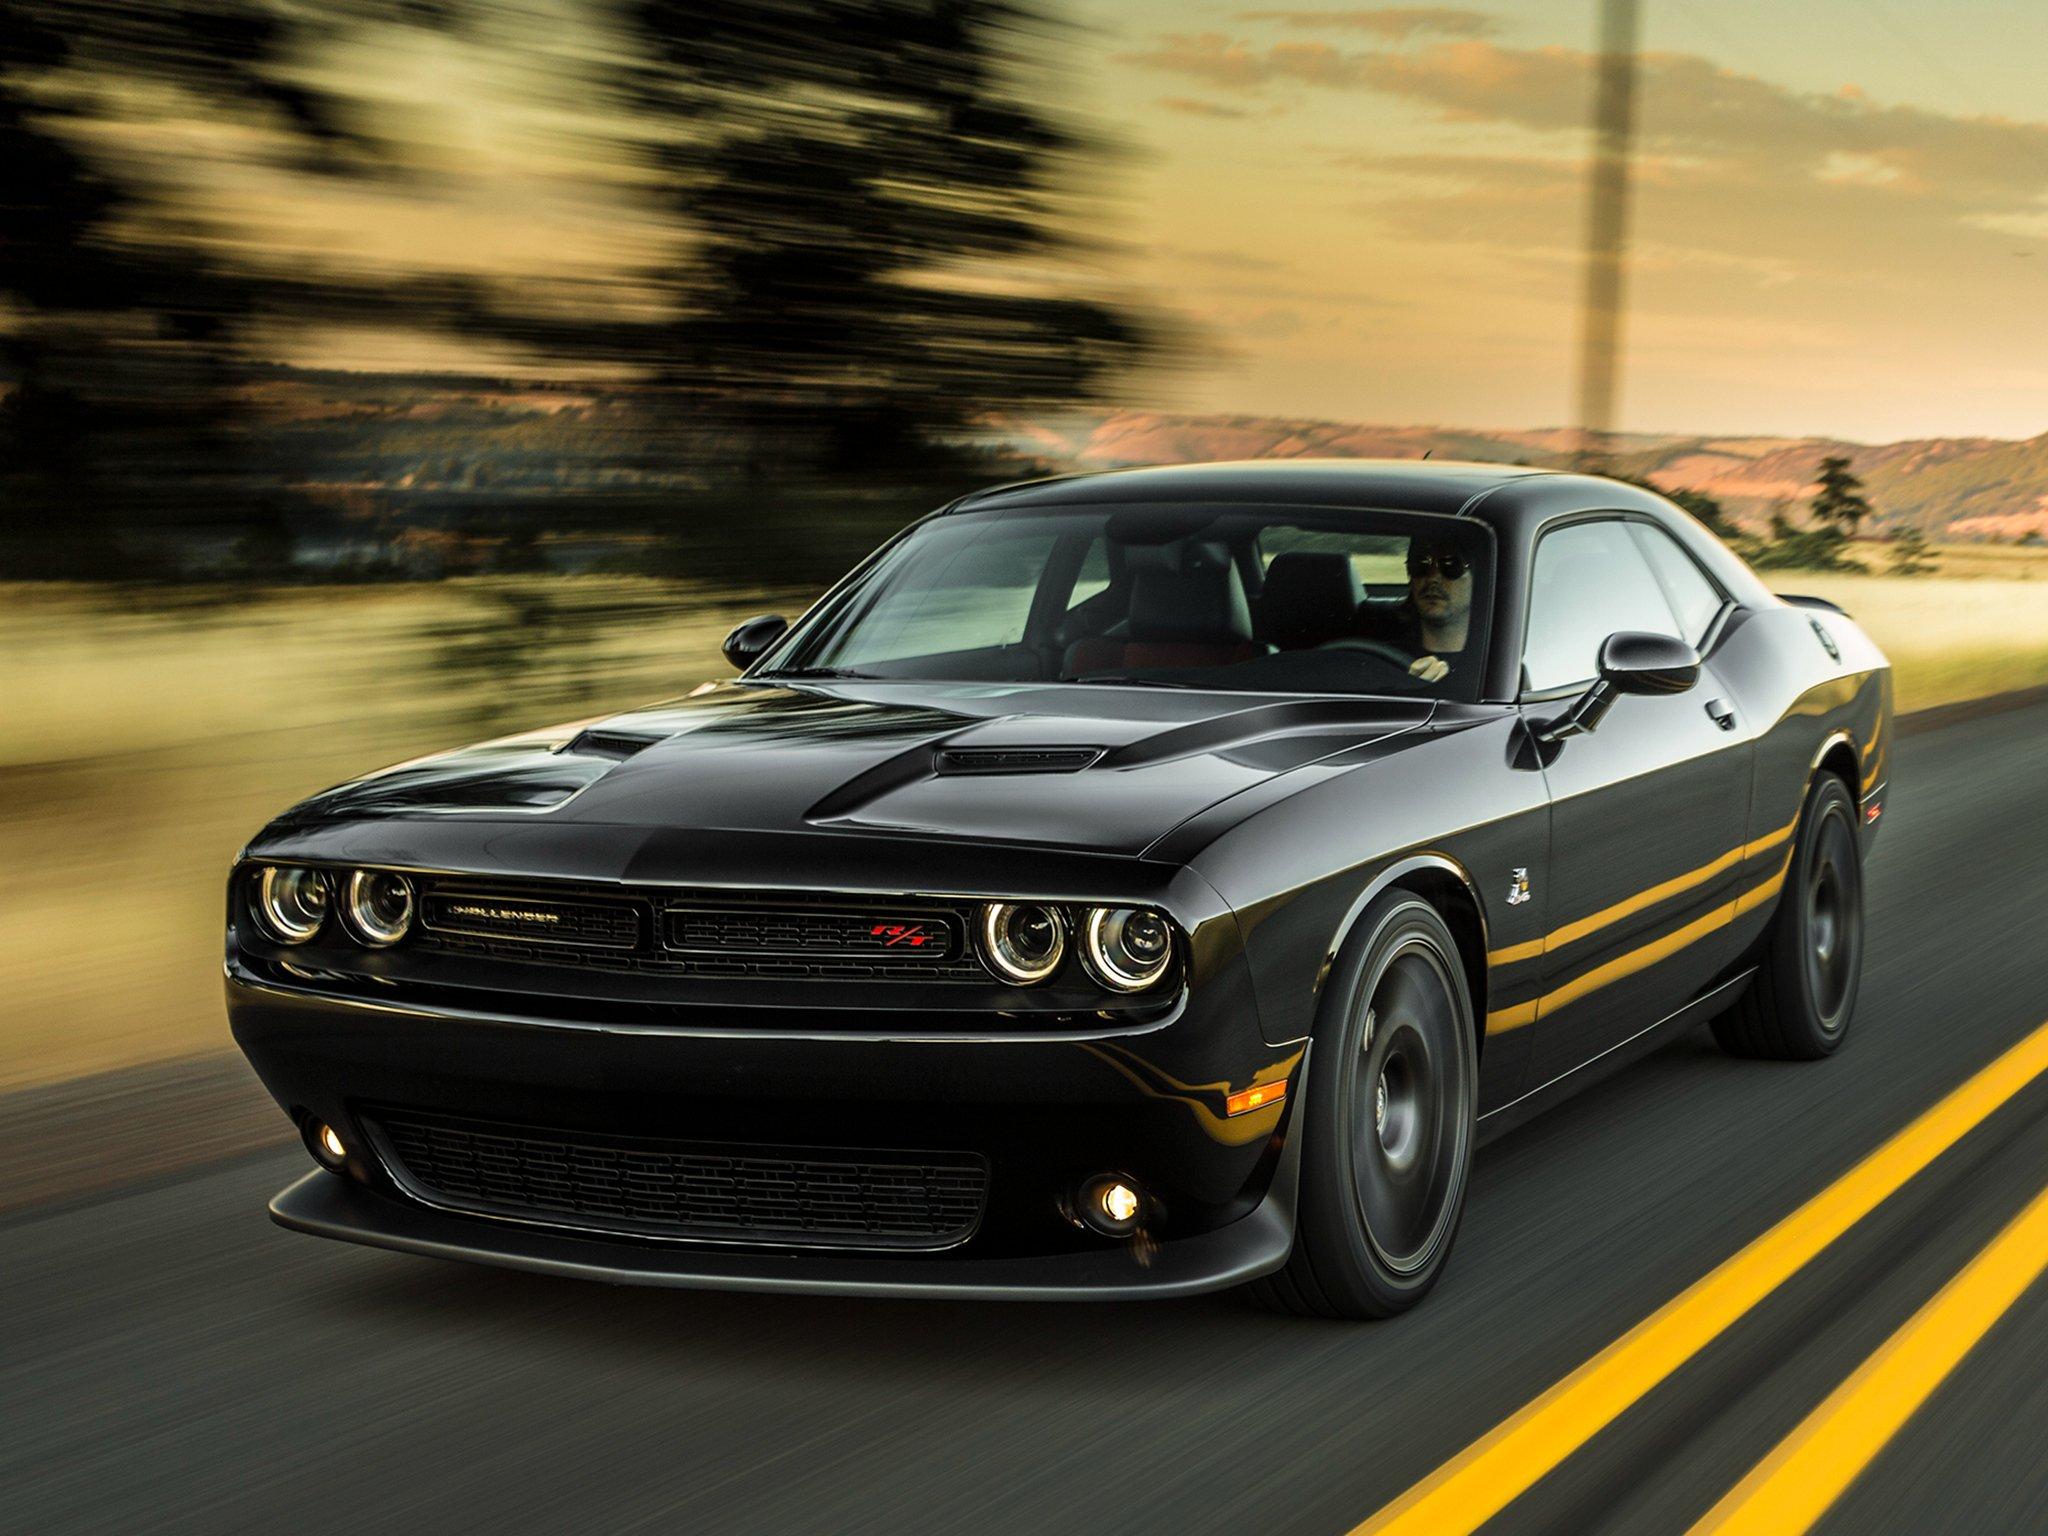 Black 2015 Dodge Challenger Wallpaper Wallpapersafari